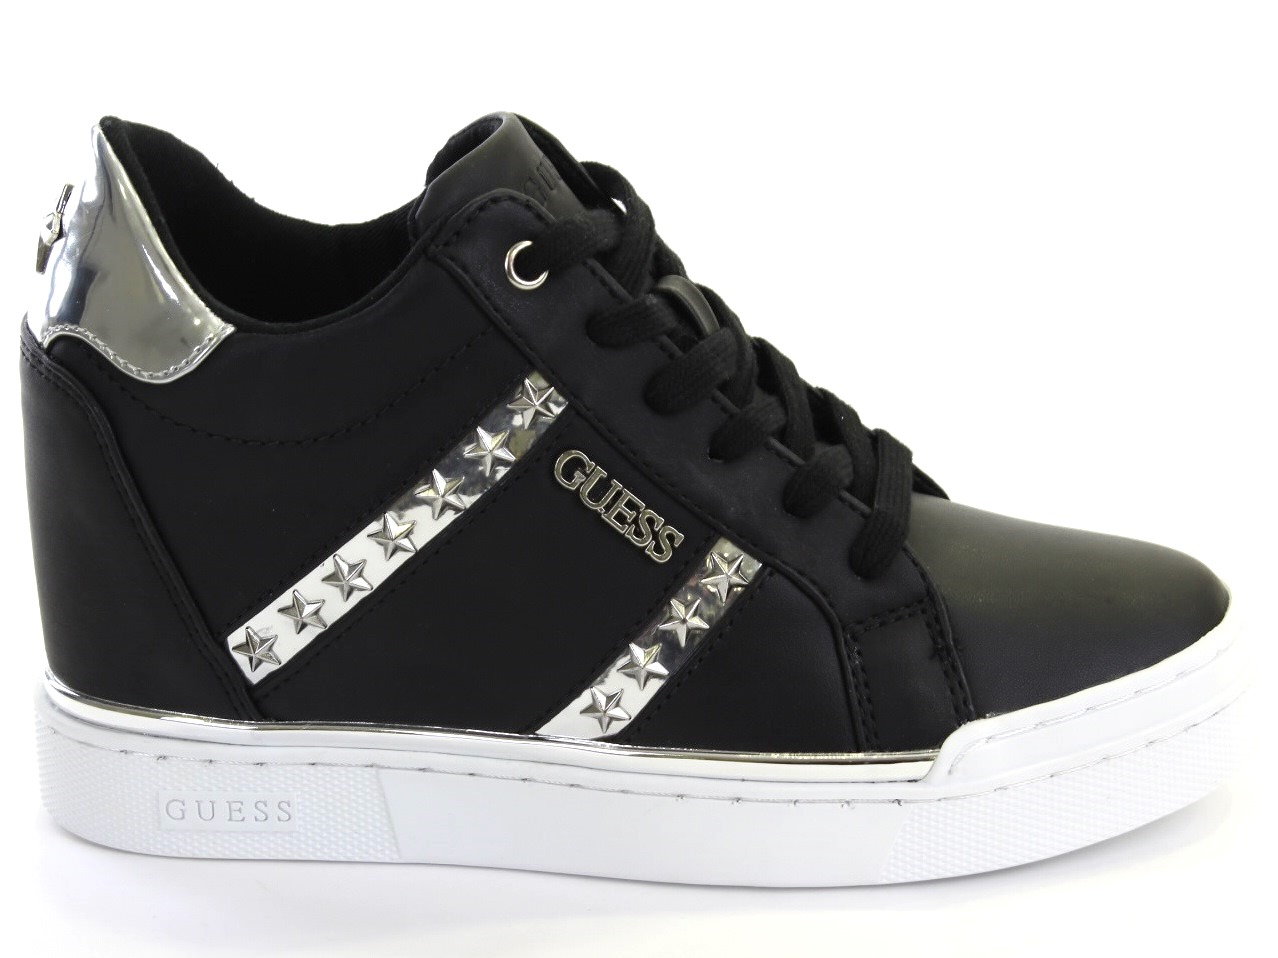 Sneakers, Espadrilles Guess - 465 FL5FAY ELE12